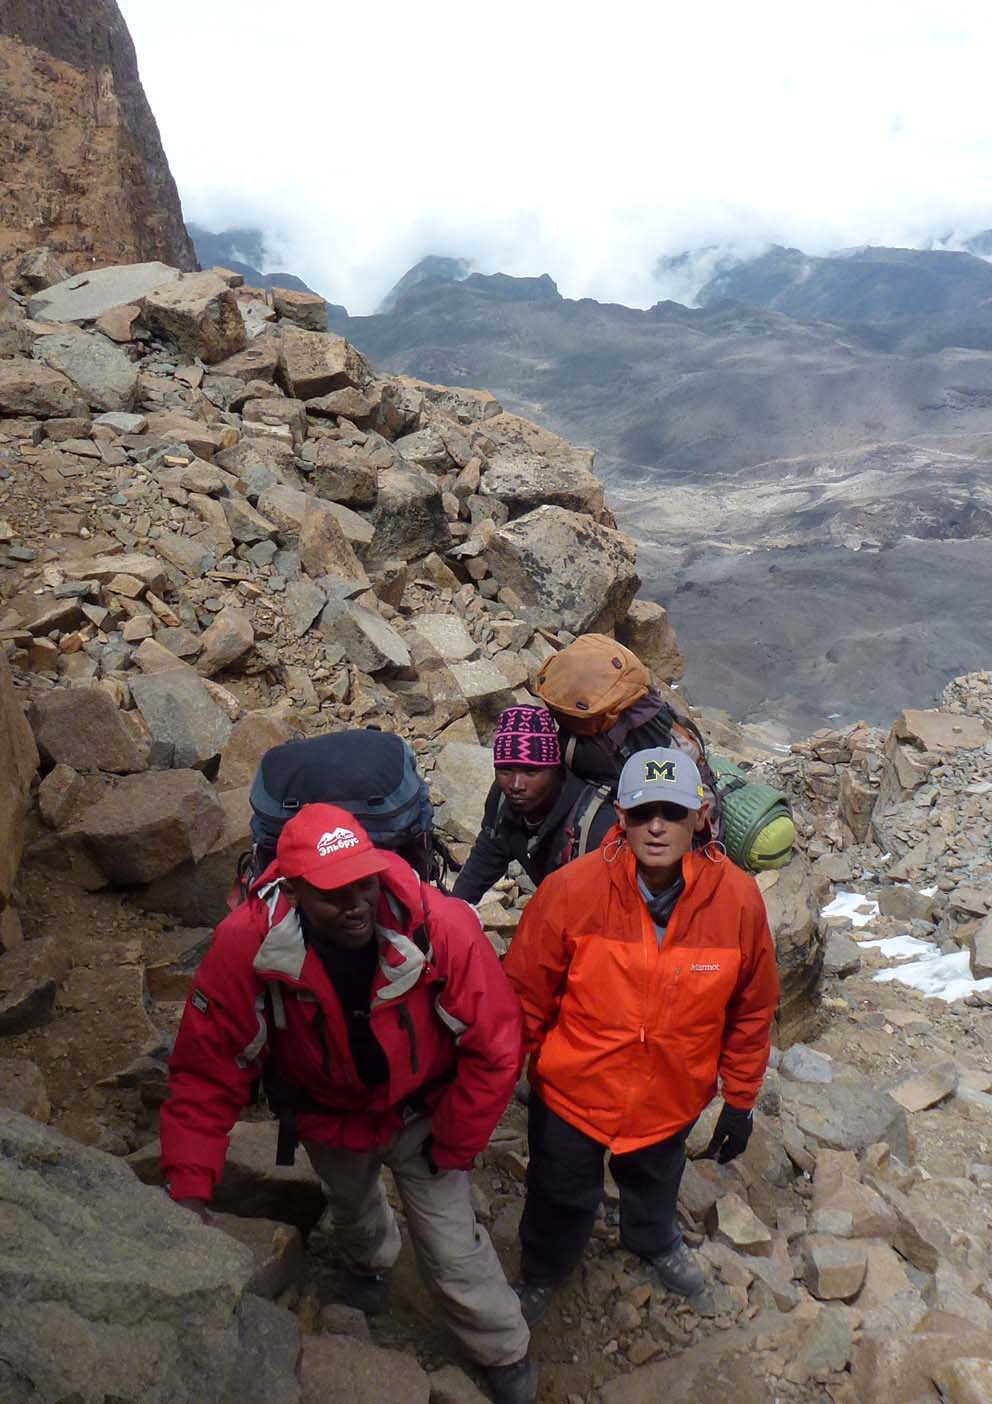 John Loussia climbing Mt. Kilimanjaro